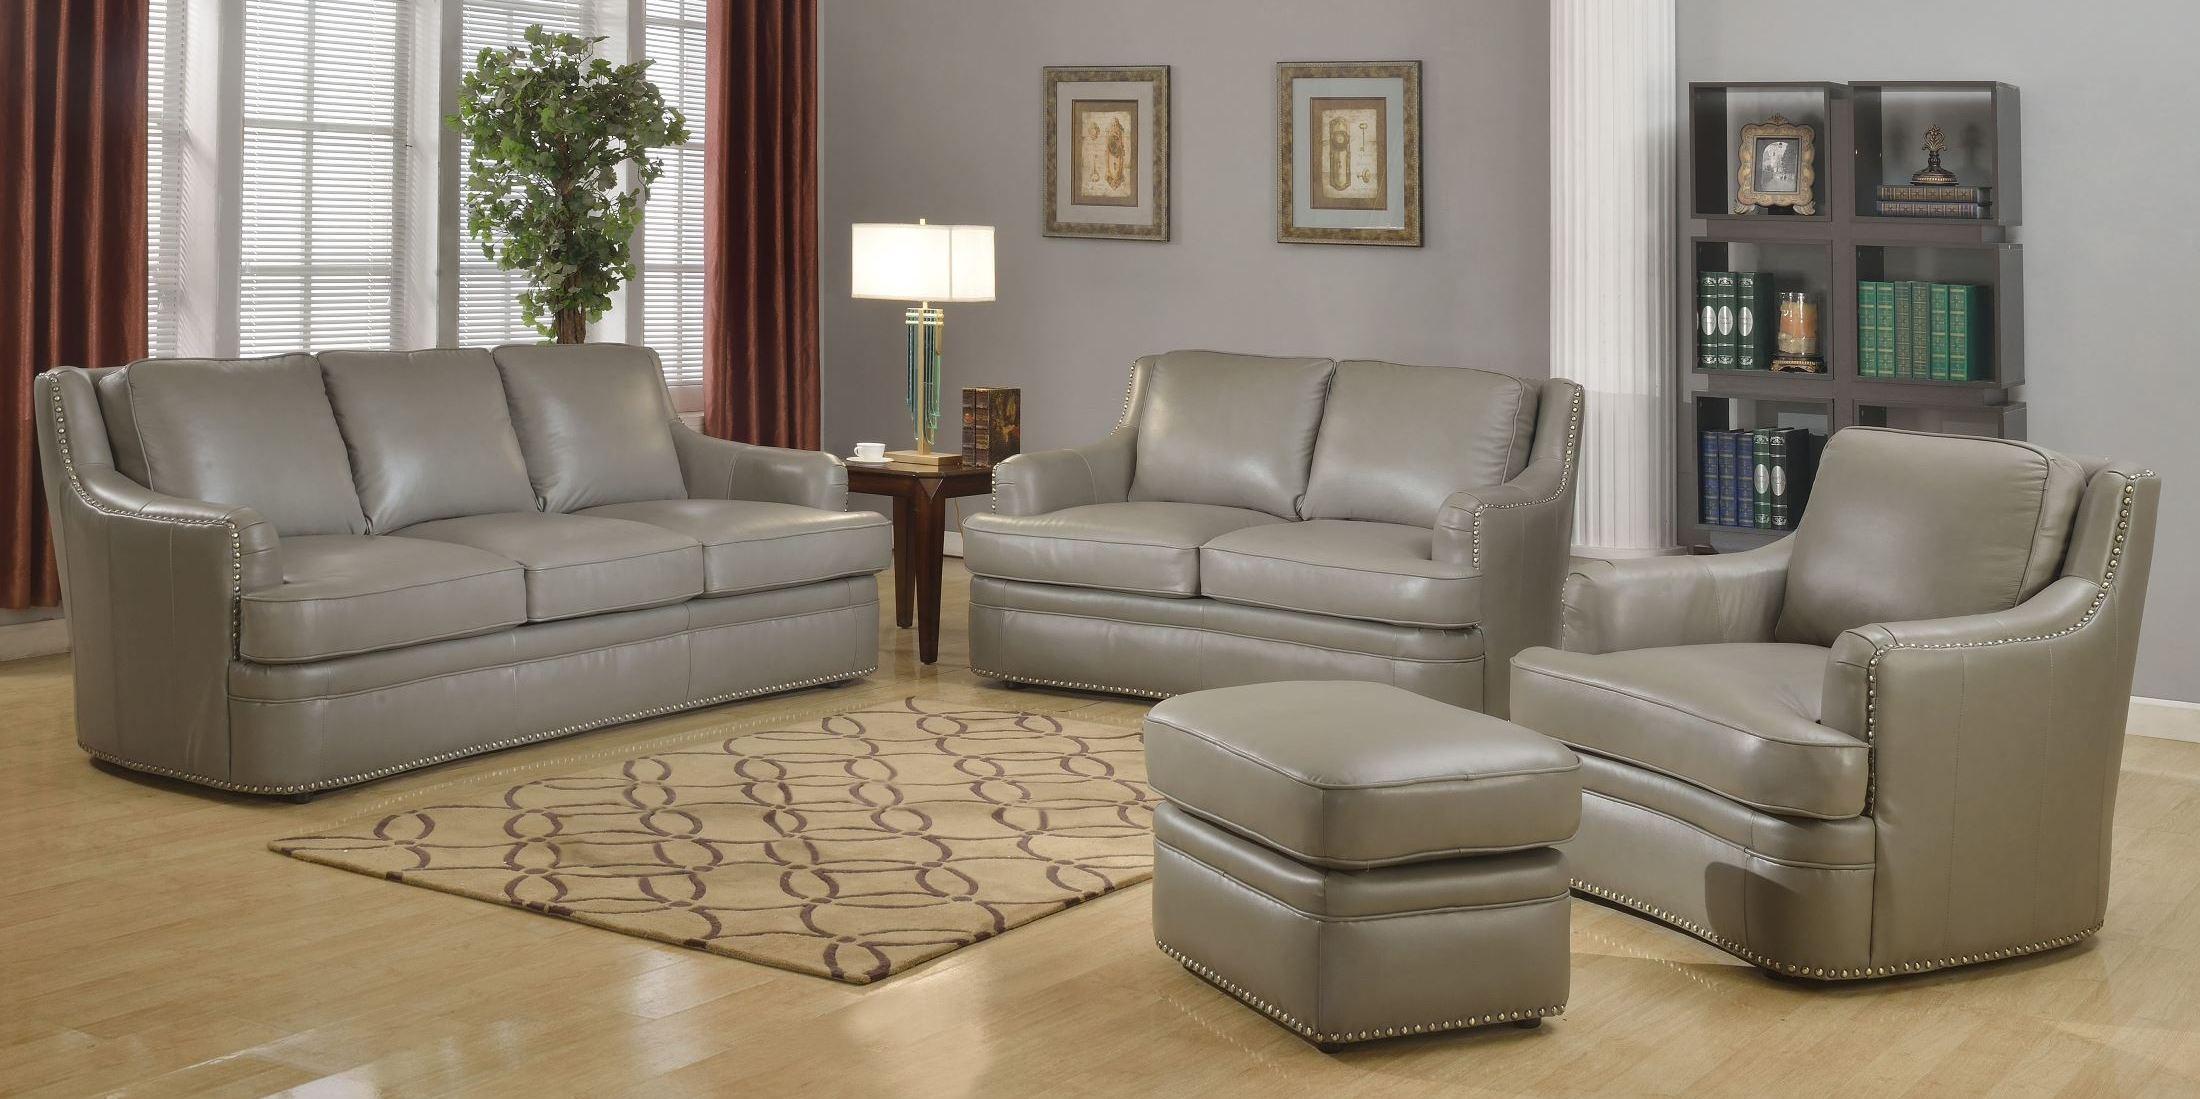 Tulsa Dark Gray Living Room Set From Leather Italia 1444 9013 031812 Cole